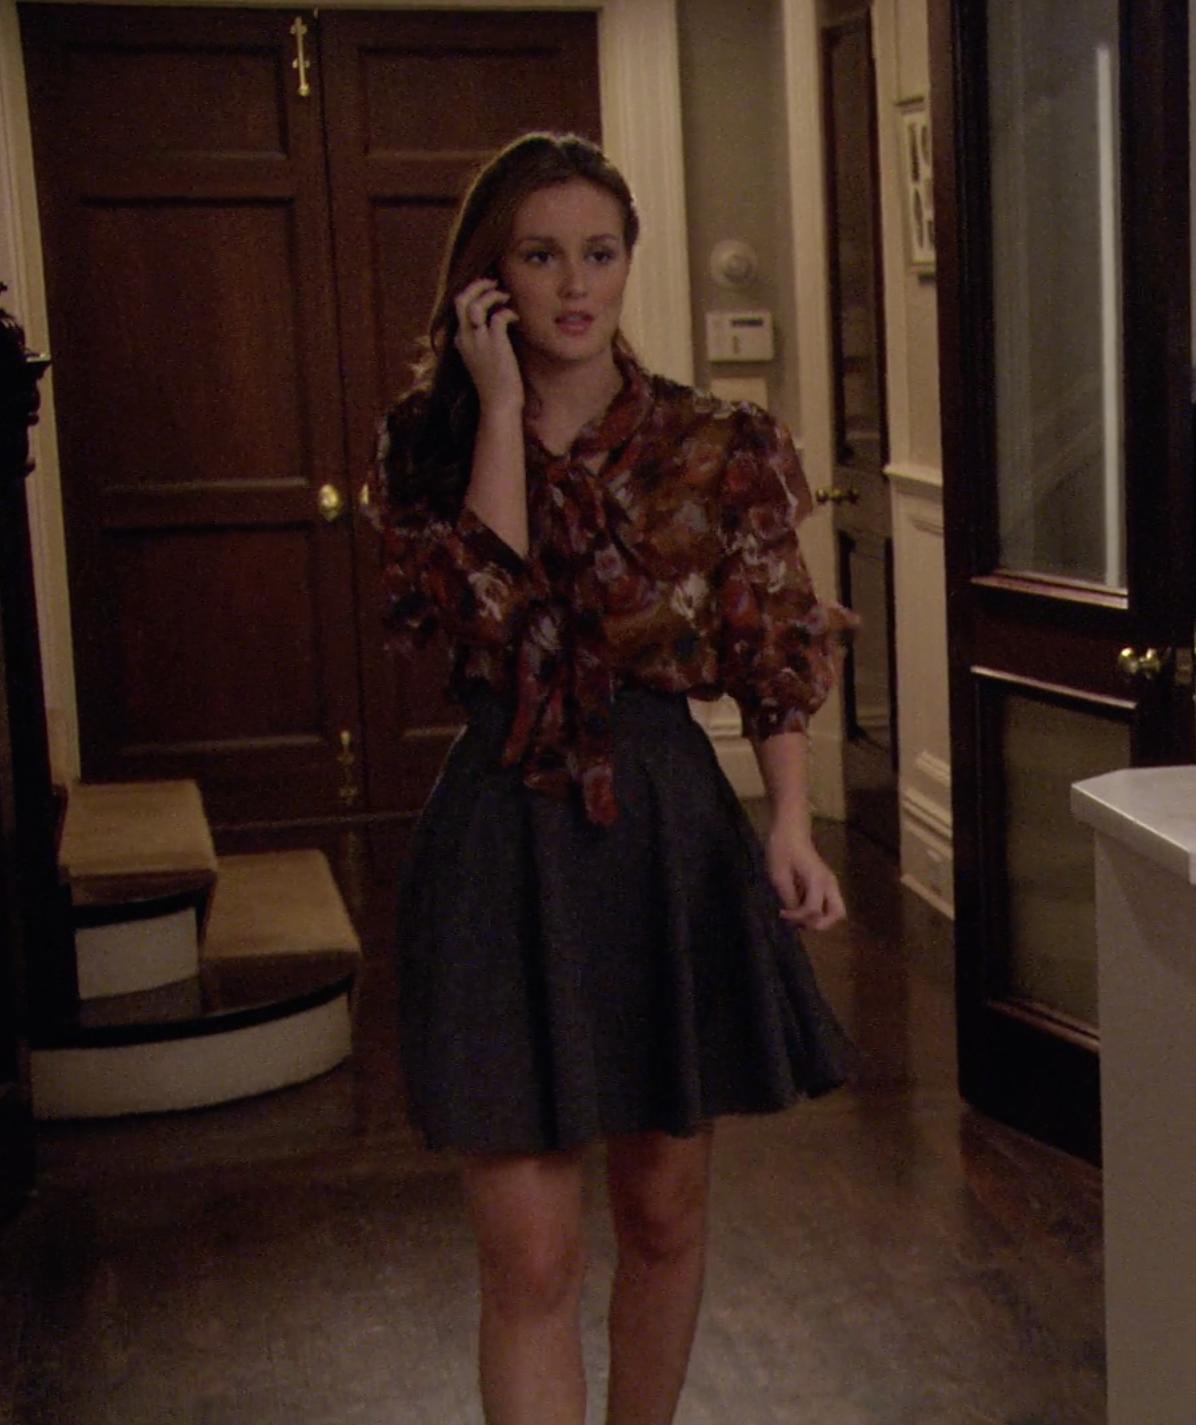 Blair Waldorf Quotes Every Woman Should Live By | Blair ...  |Blair Waldorf Hair Season 2